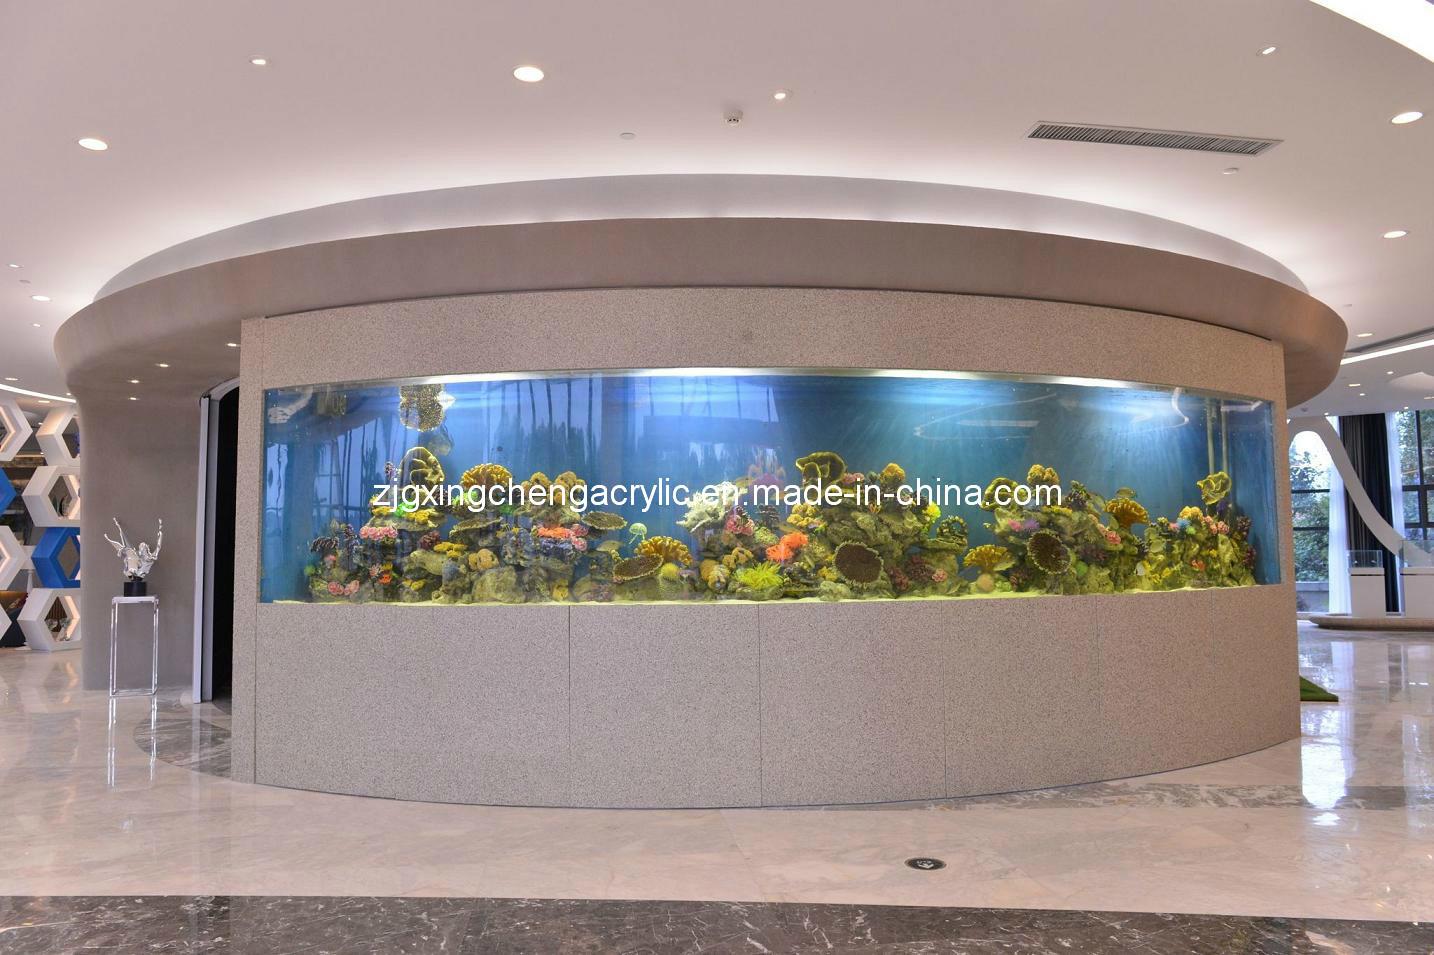 Grand aquarium acrylique rond acrylique des poissons tank for Aquarium rond prix